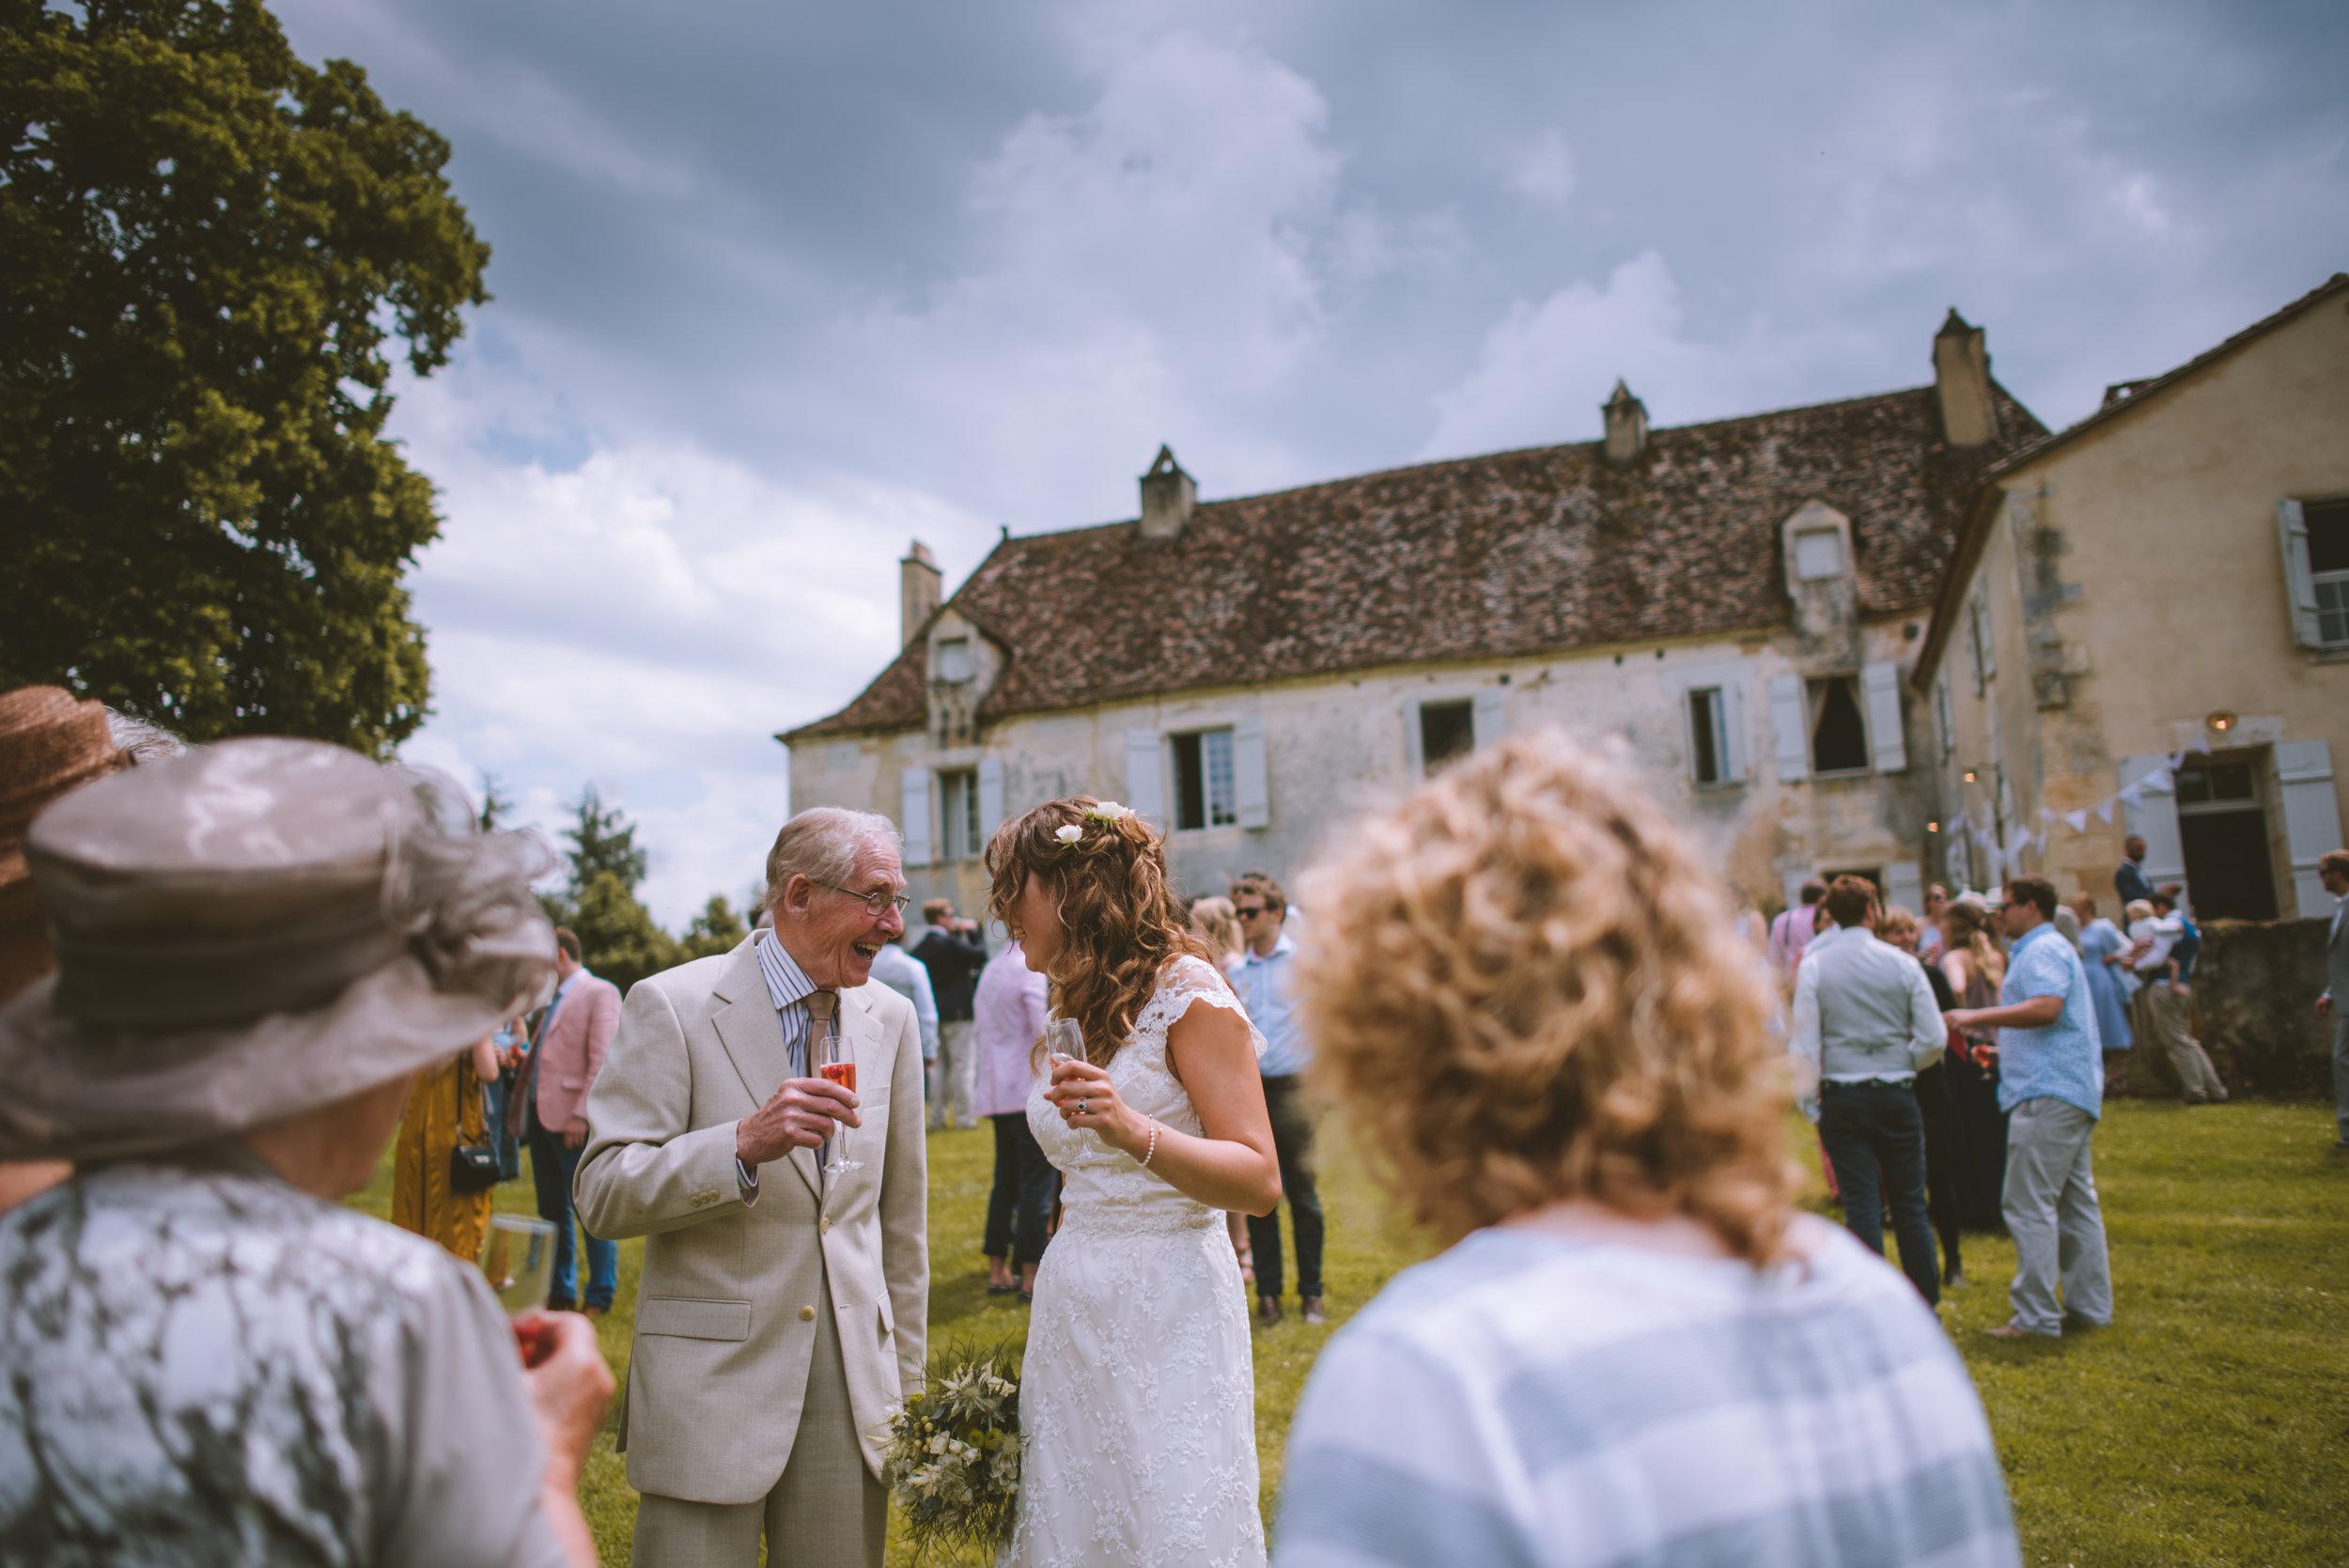 wedding-photographer-dordogne-mark-shaw-11.jpg